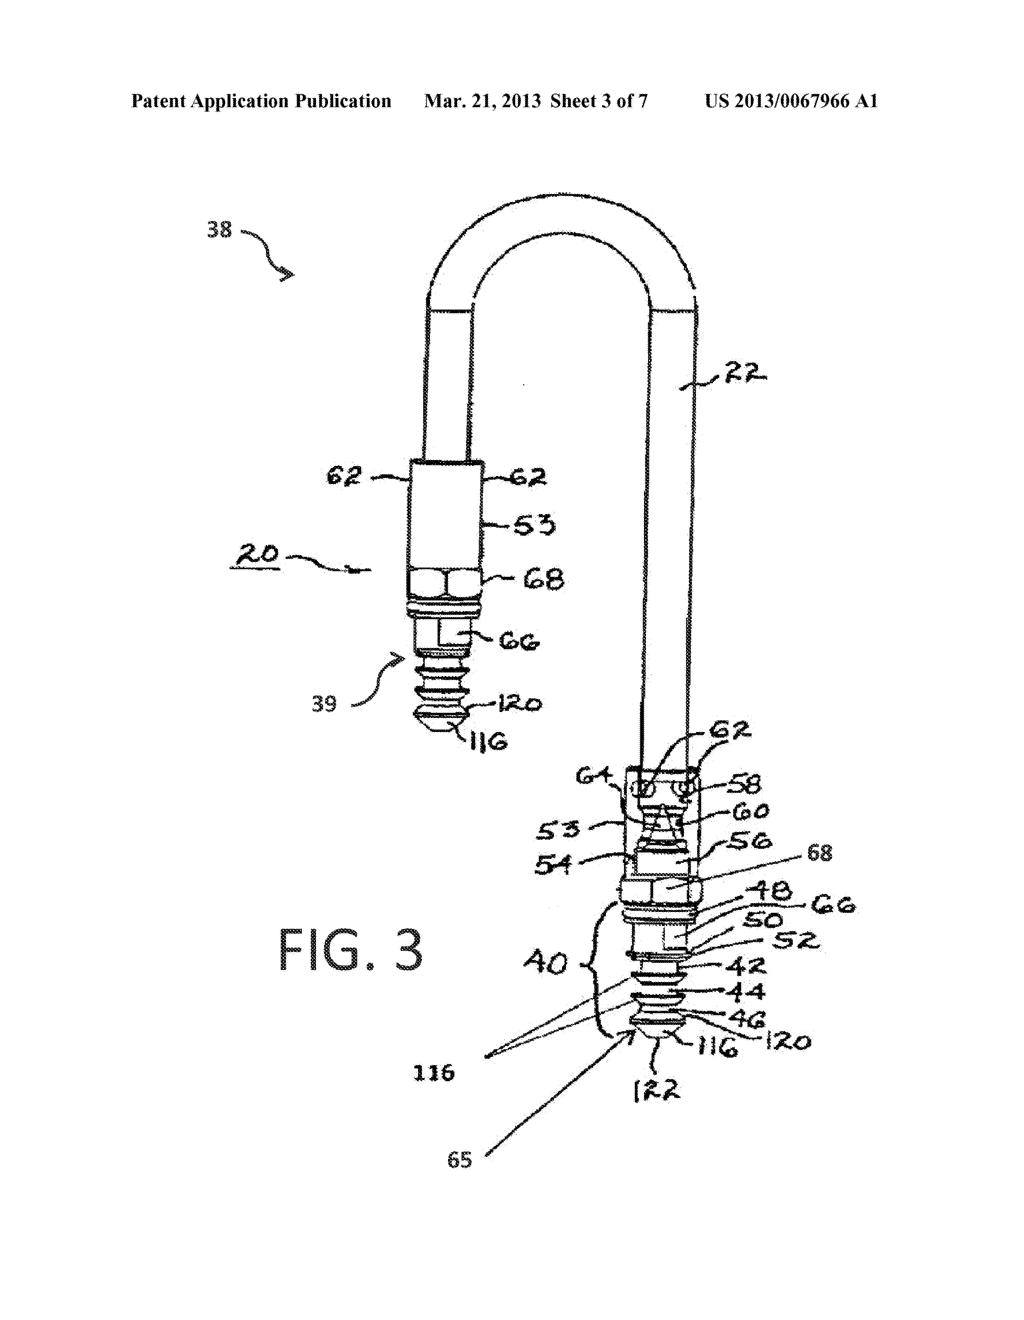 electronic cable lock system diagram schematic and image 04 rh patentsencyclopedia com Jeep Door Lock Diagram Padlock Parts Diagram